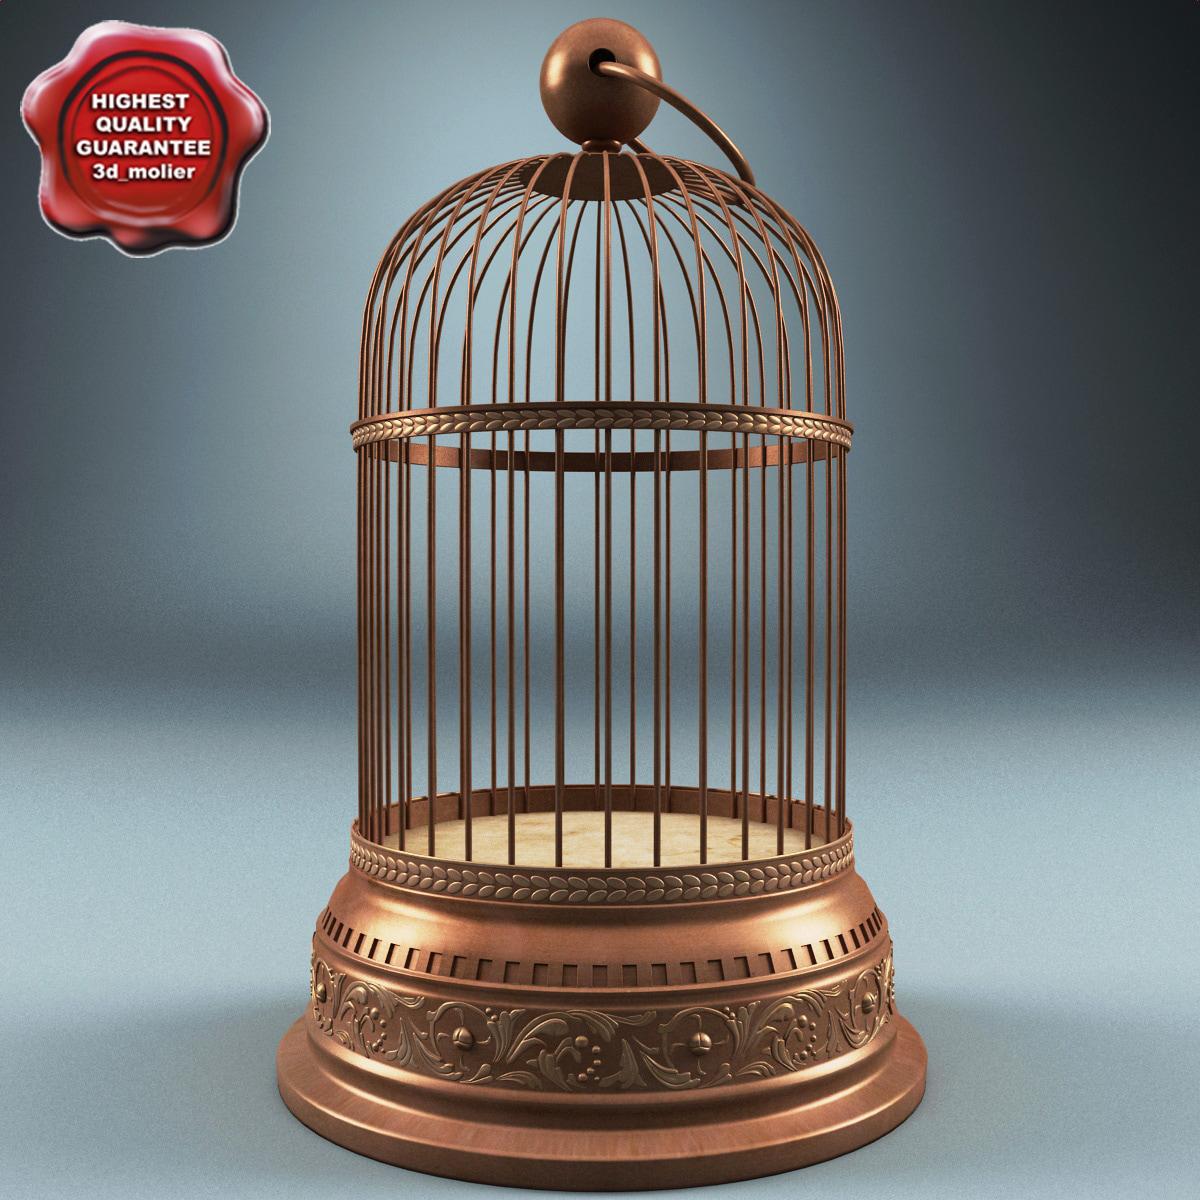 Old_Bird_Cage_00.jpg